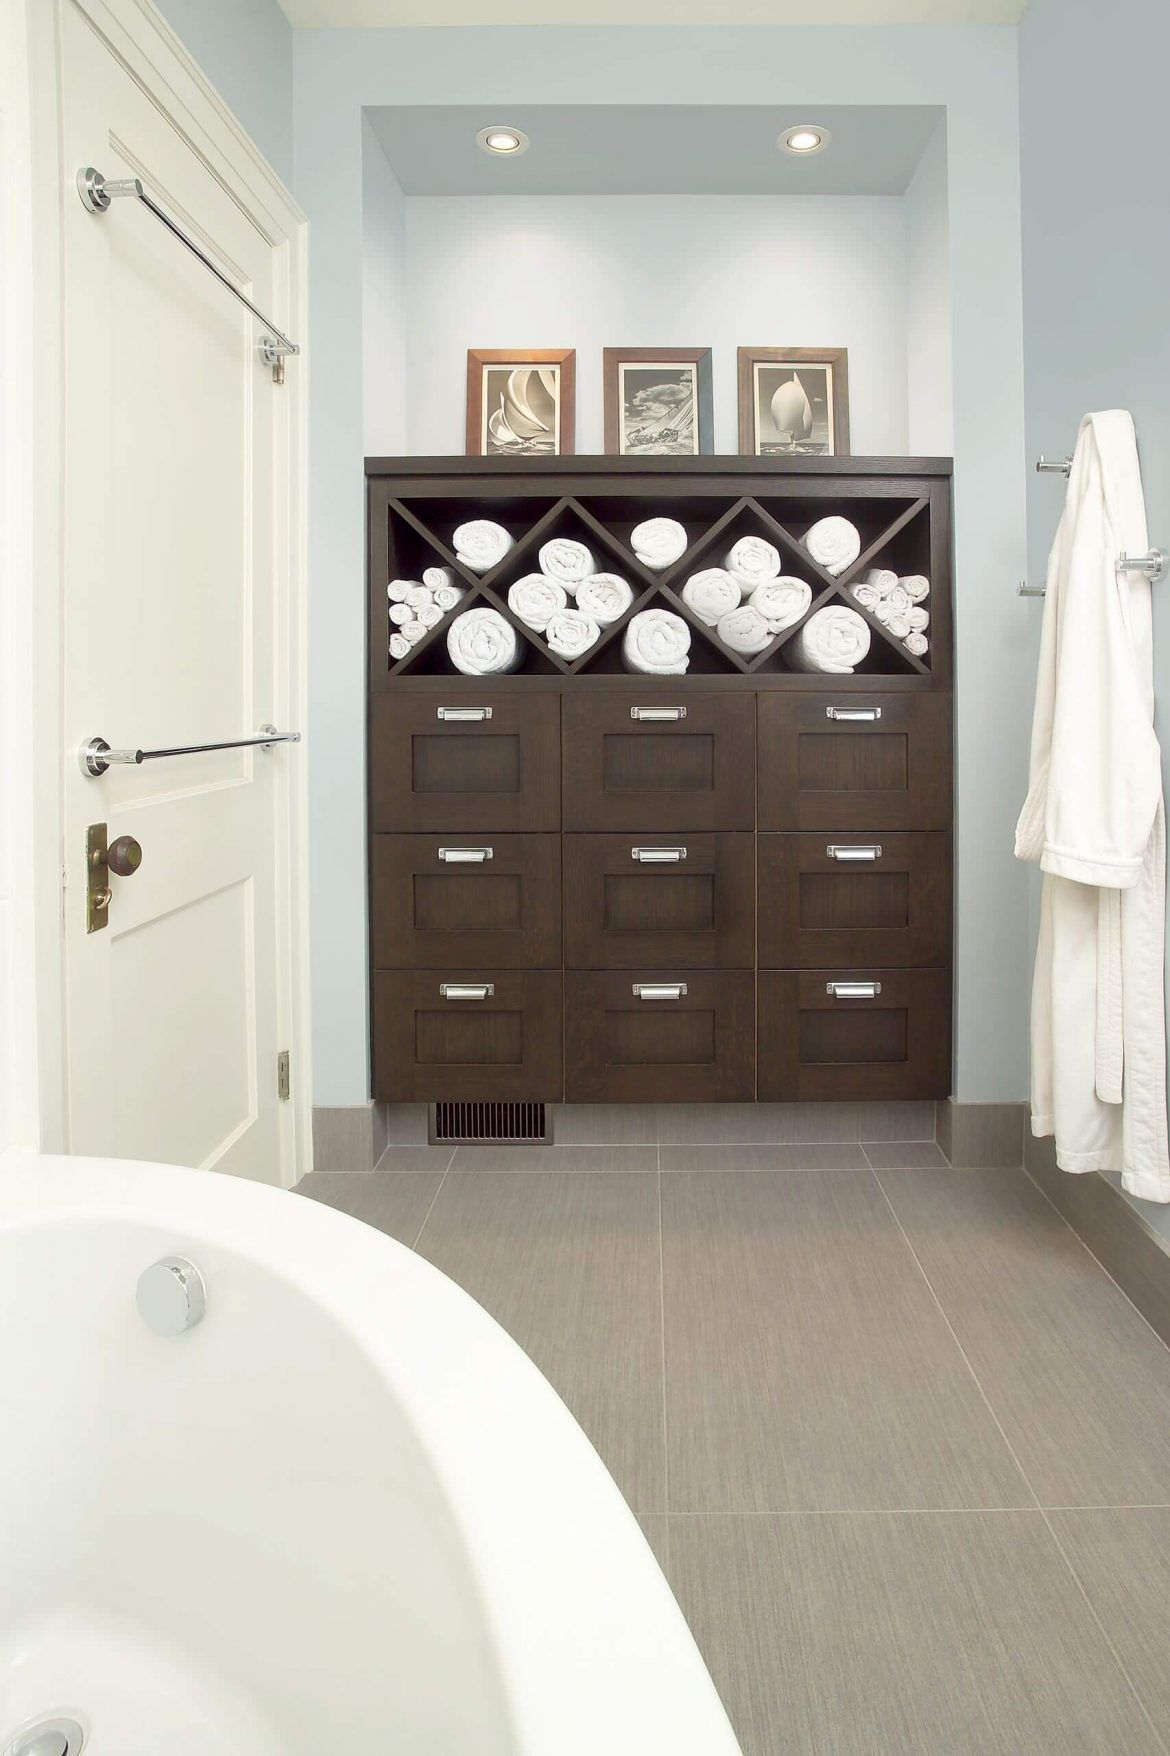 37 Towel Storage Ideas For Your Bathroom 2020 Edition Eclectic Bathroom Eclectic Bathroom Design Bathroom Towel Storage